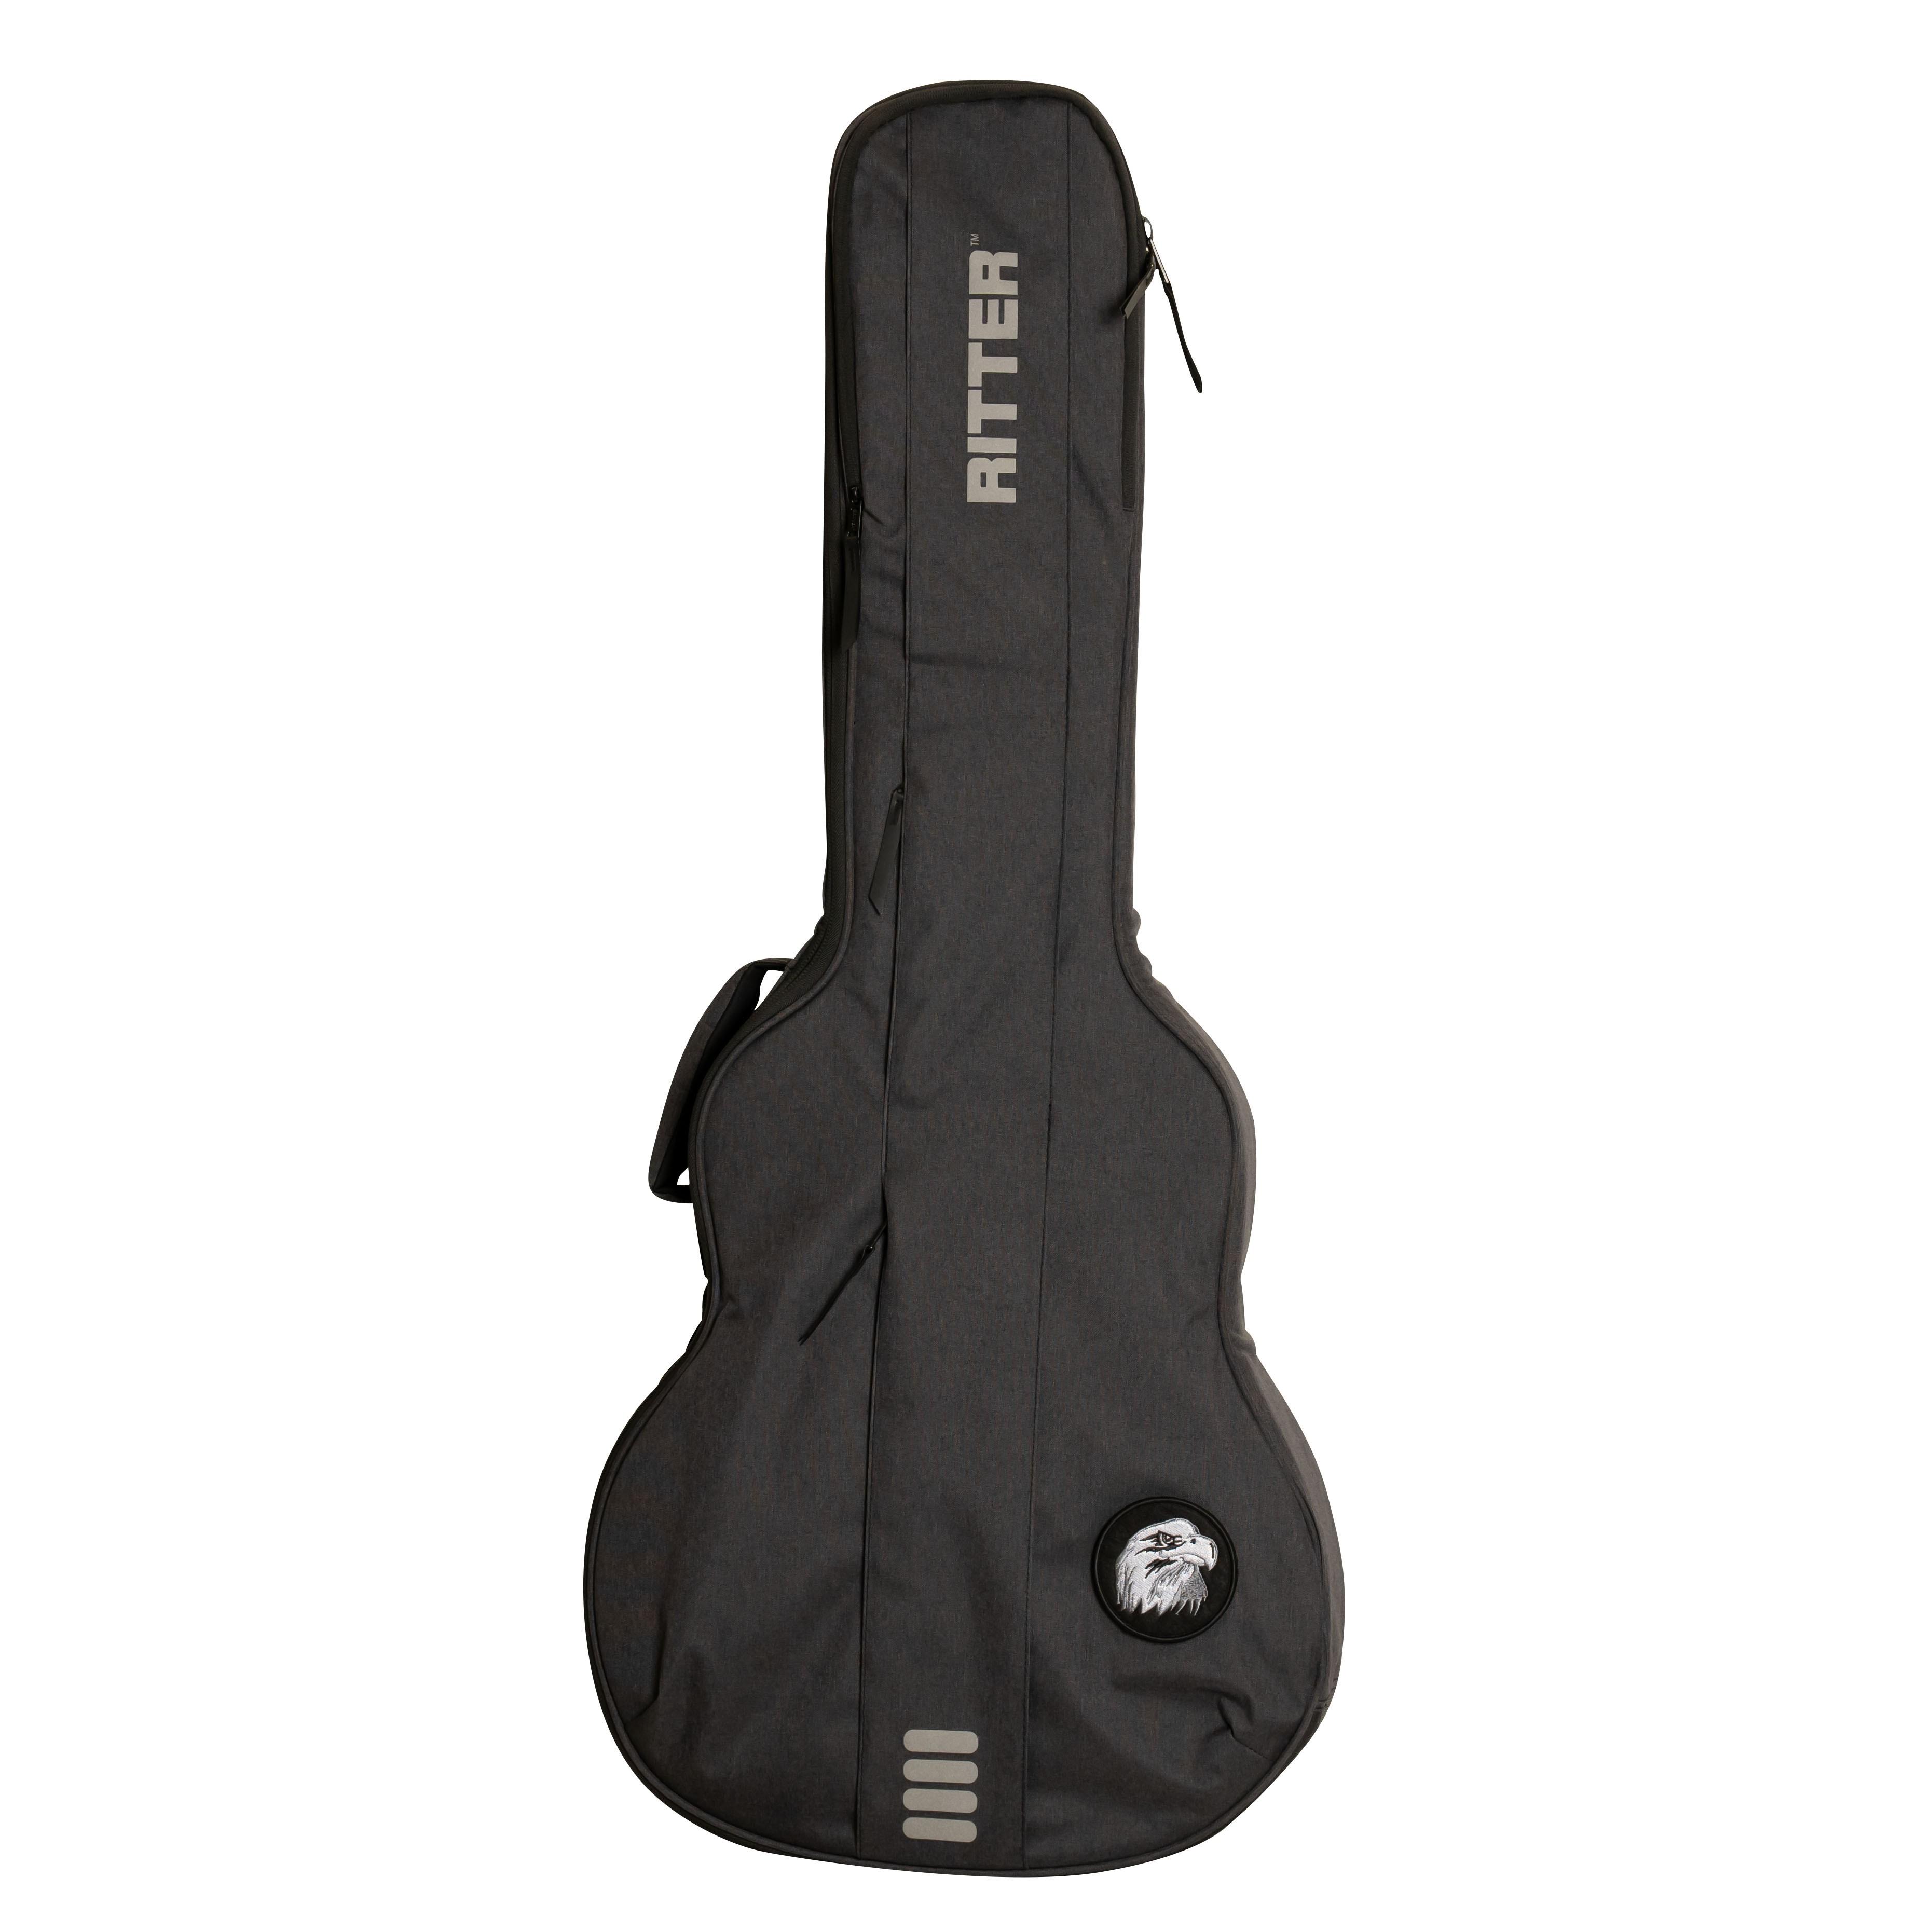 Ritter Bern 335 Style Semi Guitar Bag - Anthracite (RGB4-SA)